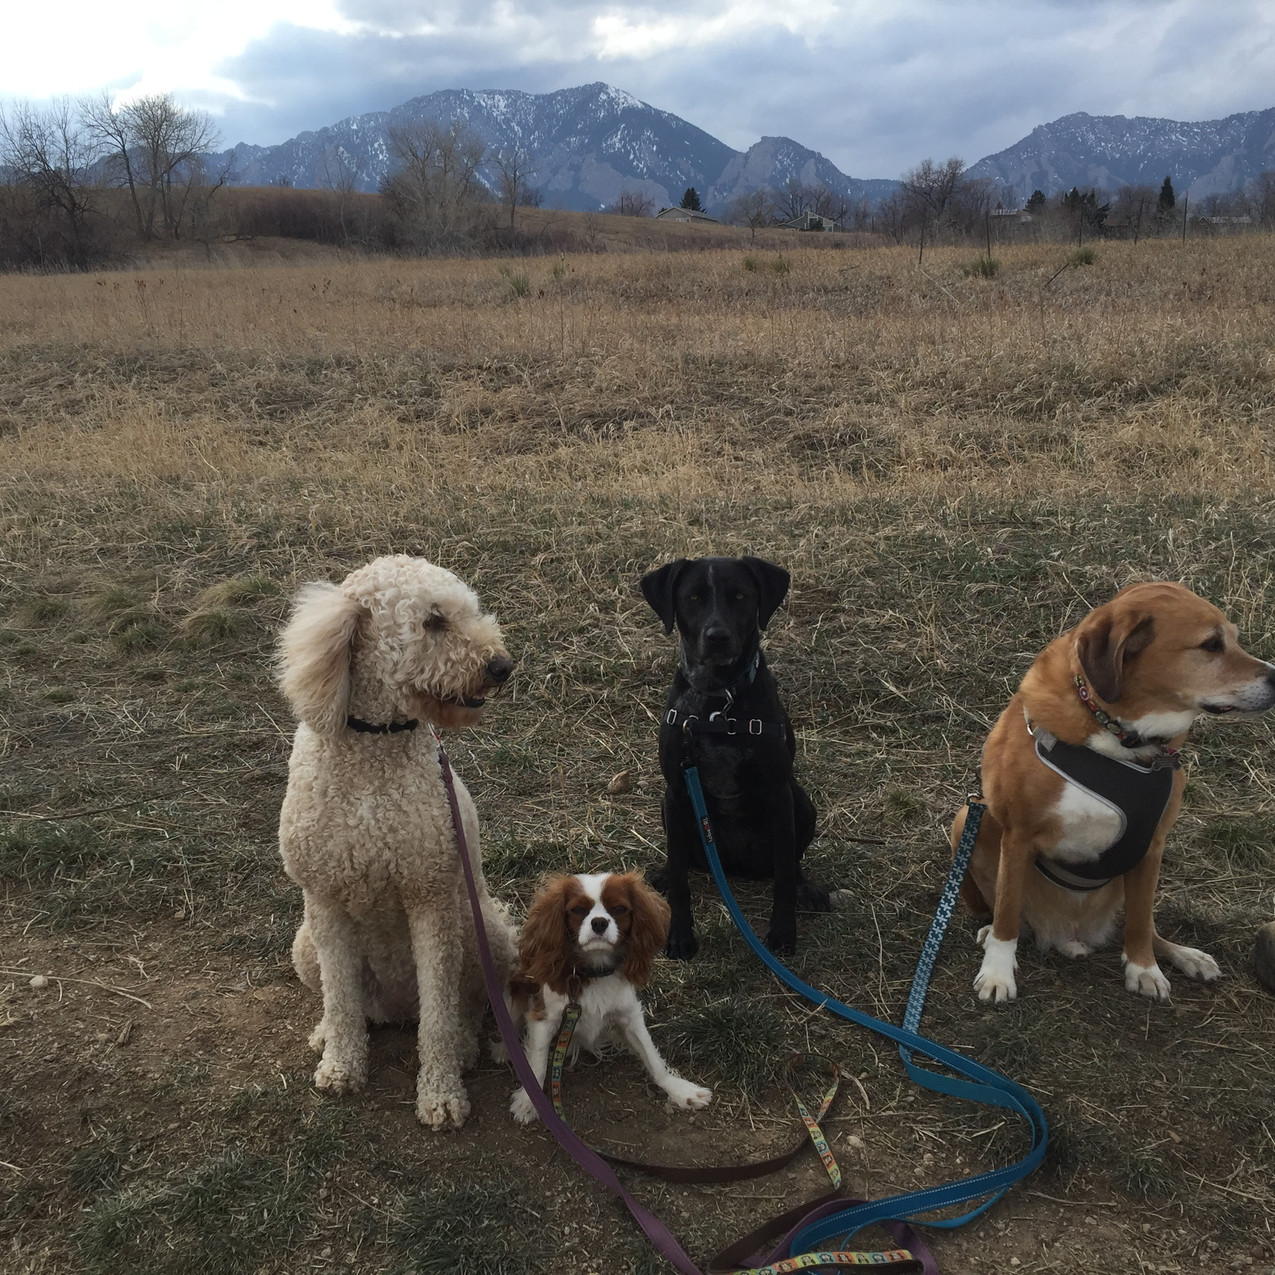 Zoey, Zoe, Avo, Cooper